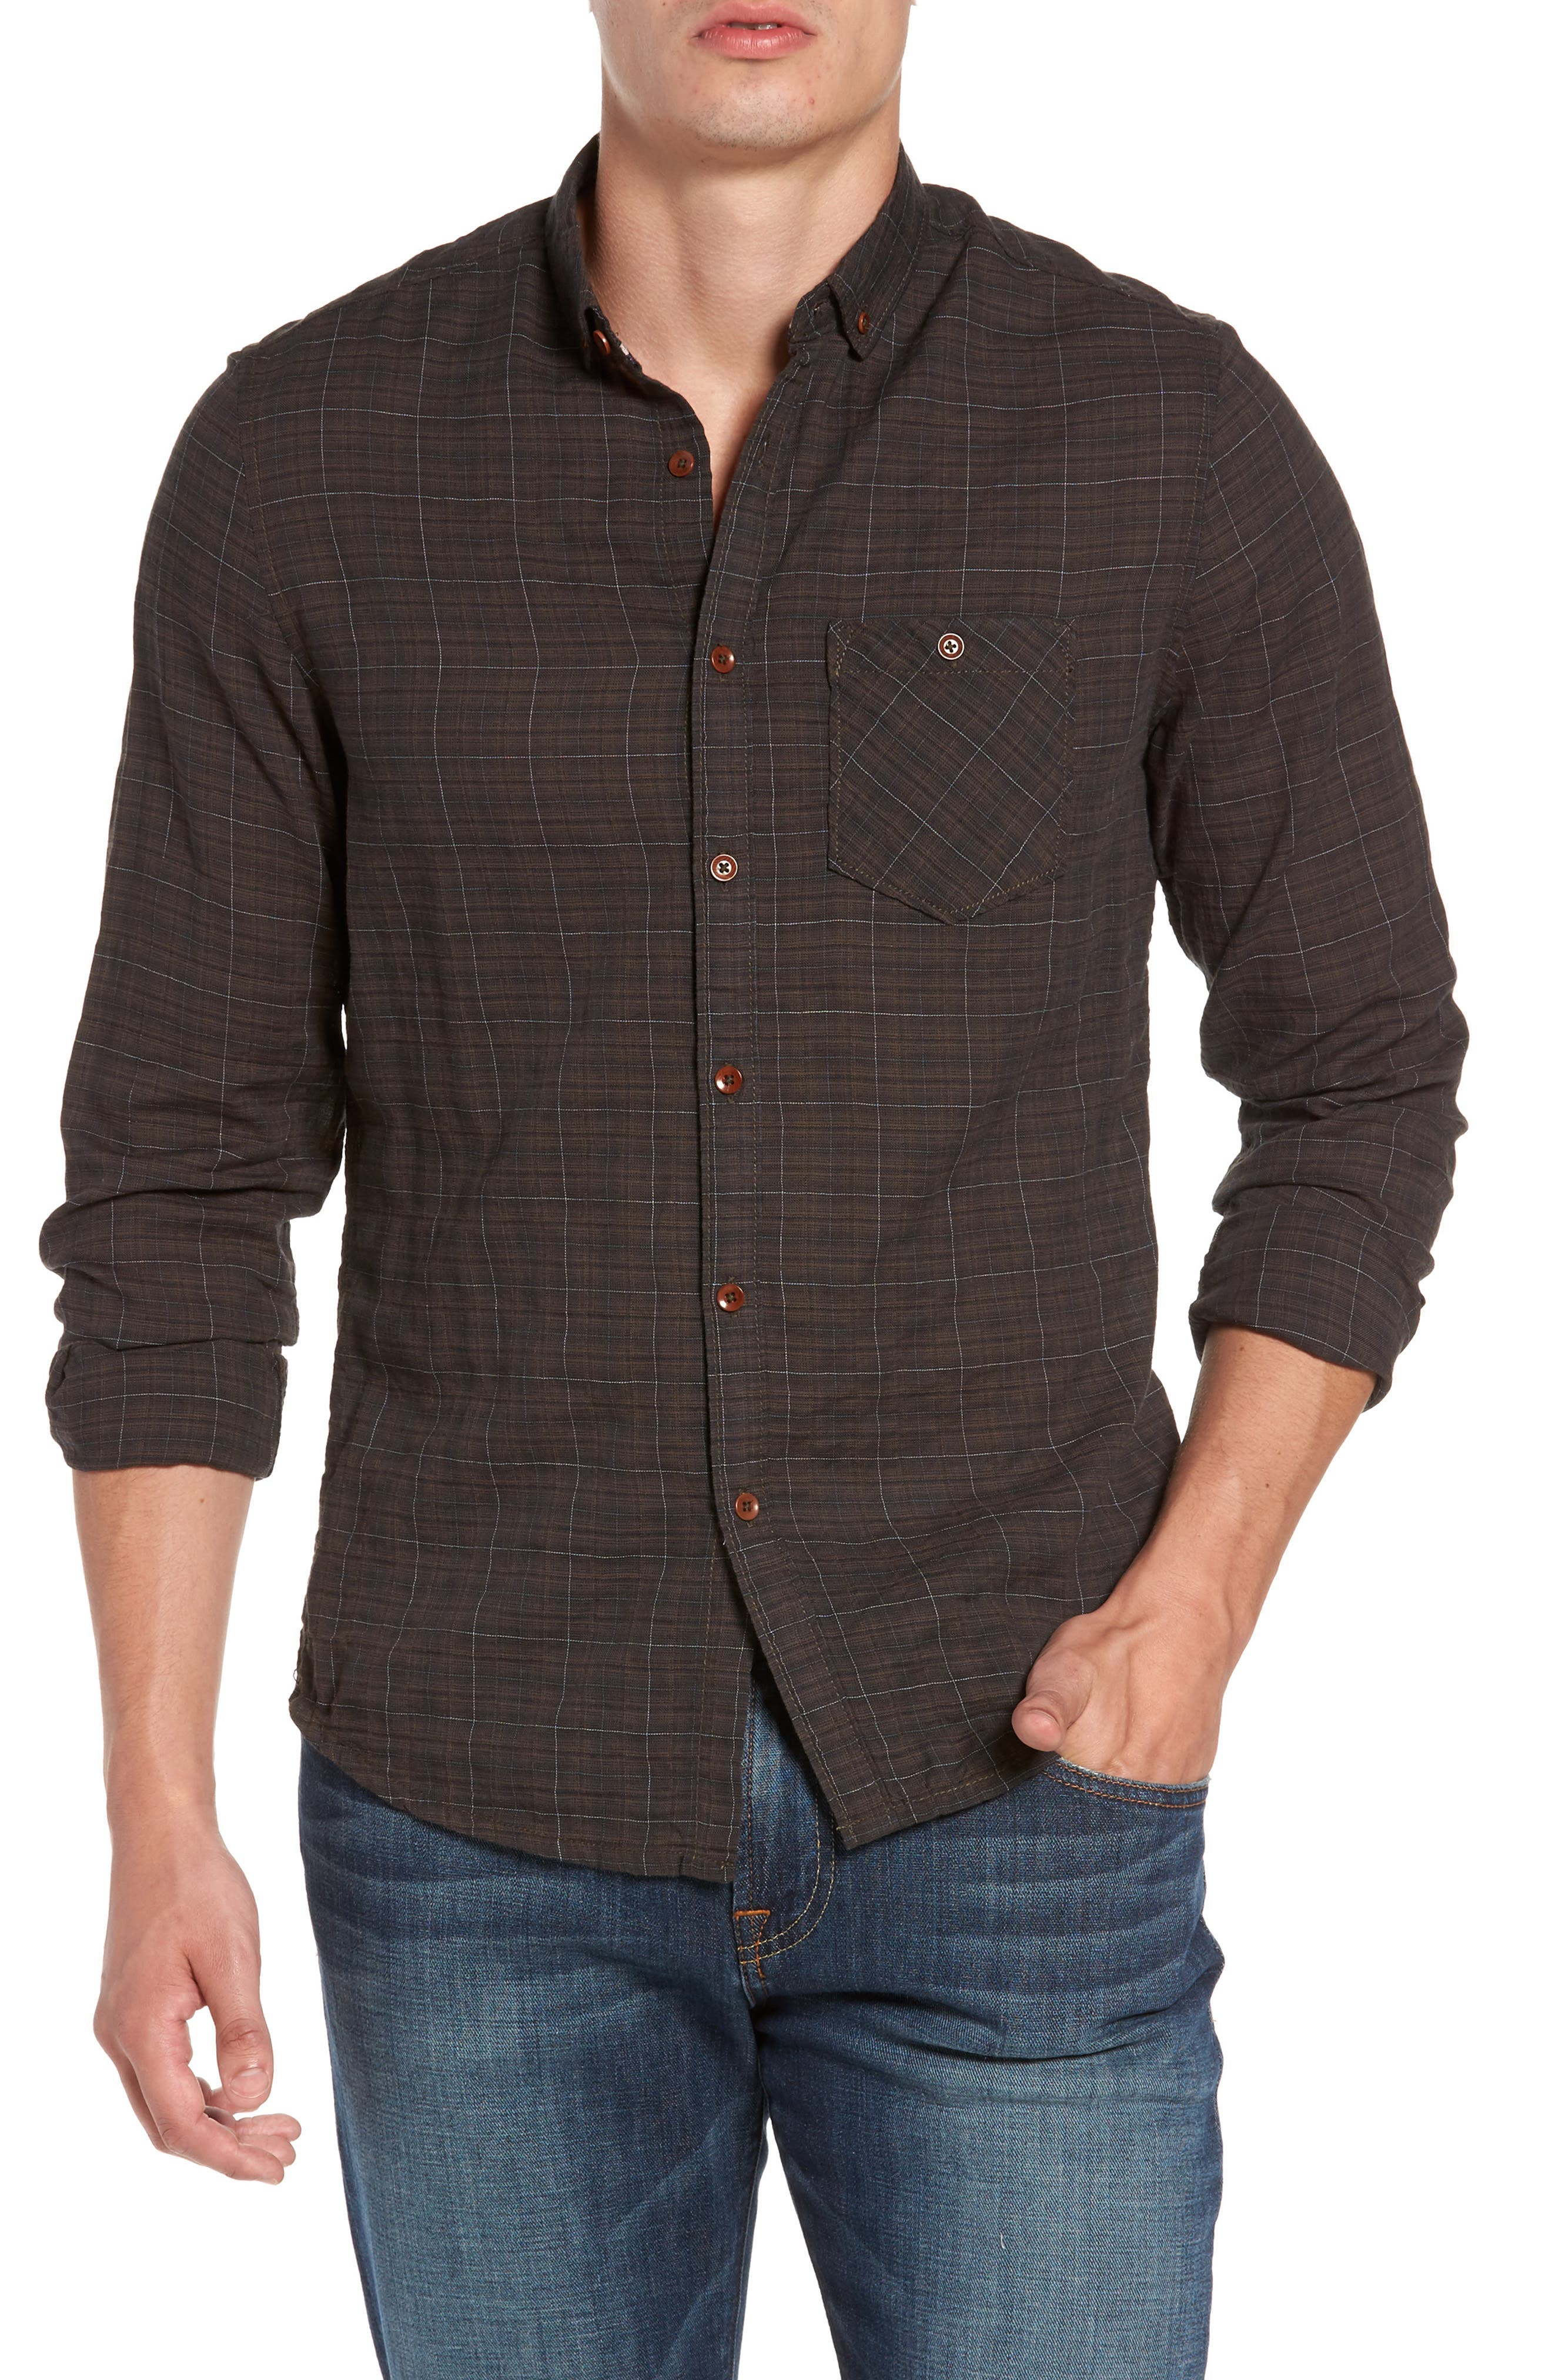 Molera Pucker Plaid Sport Shirt,                         Main,                         color, Asphalt